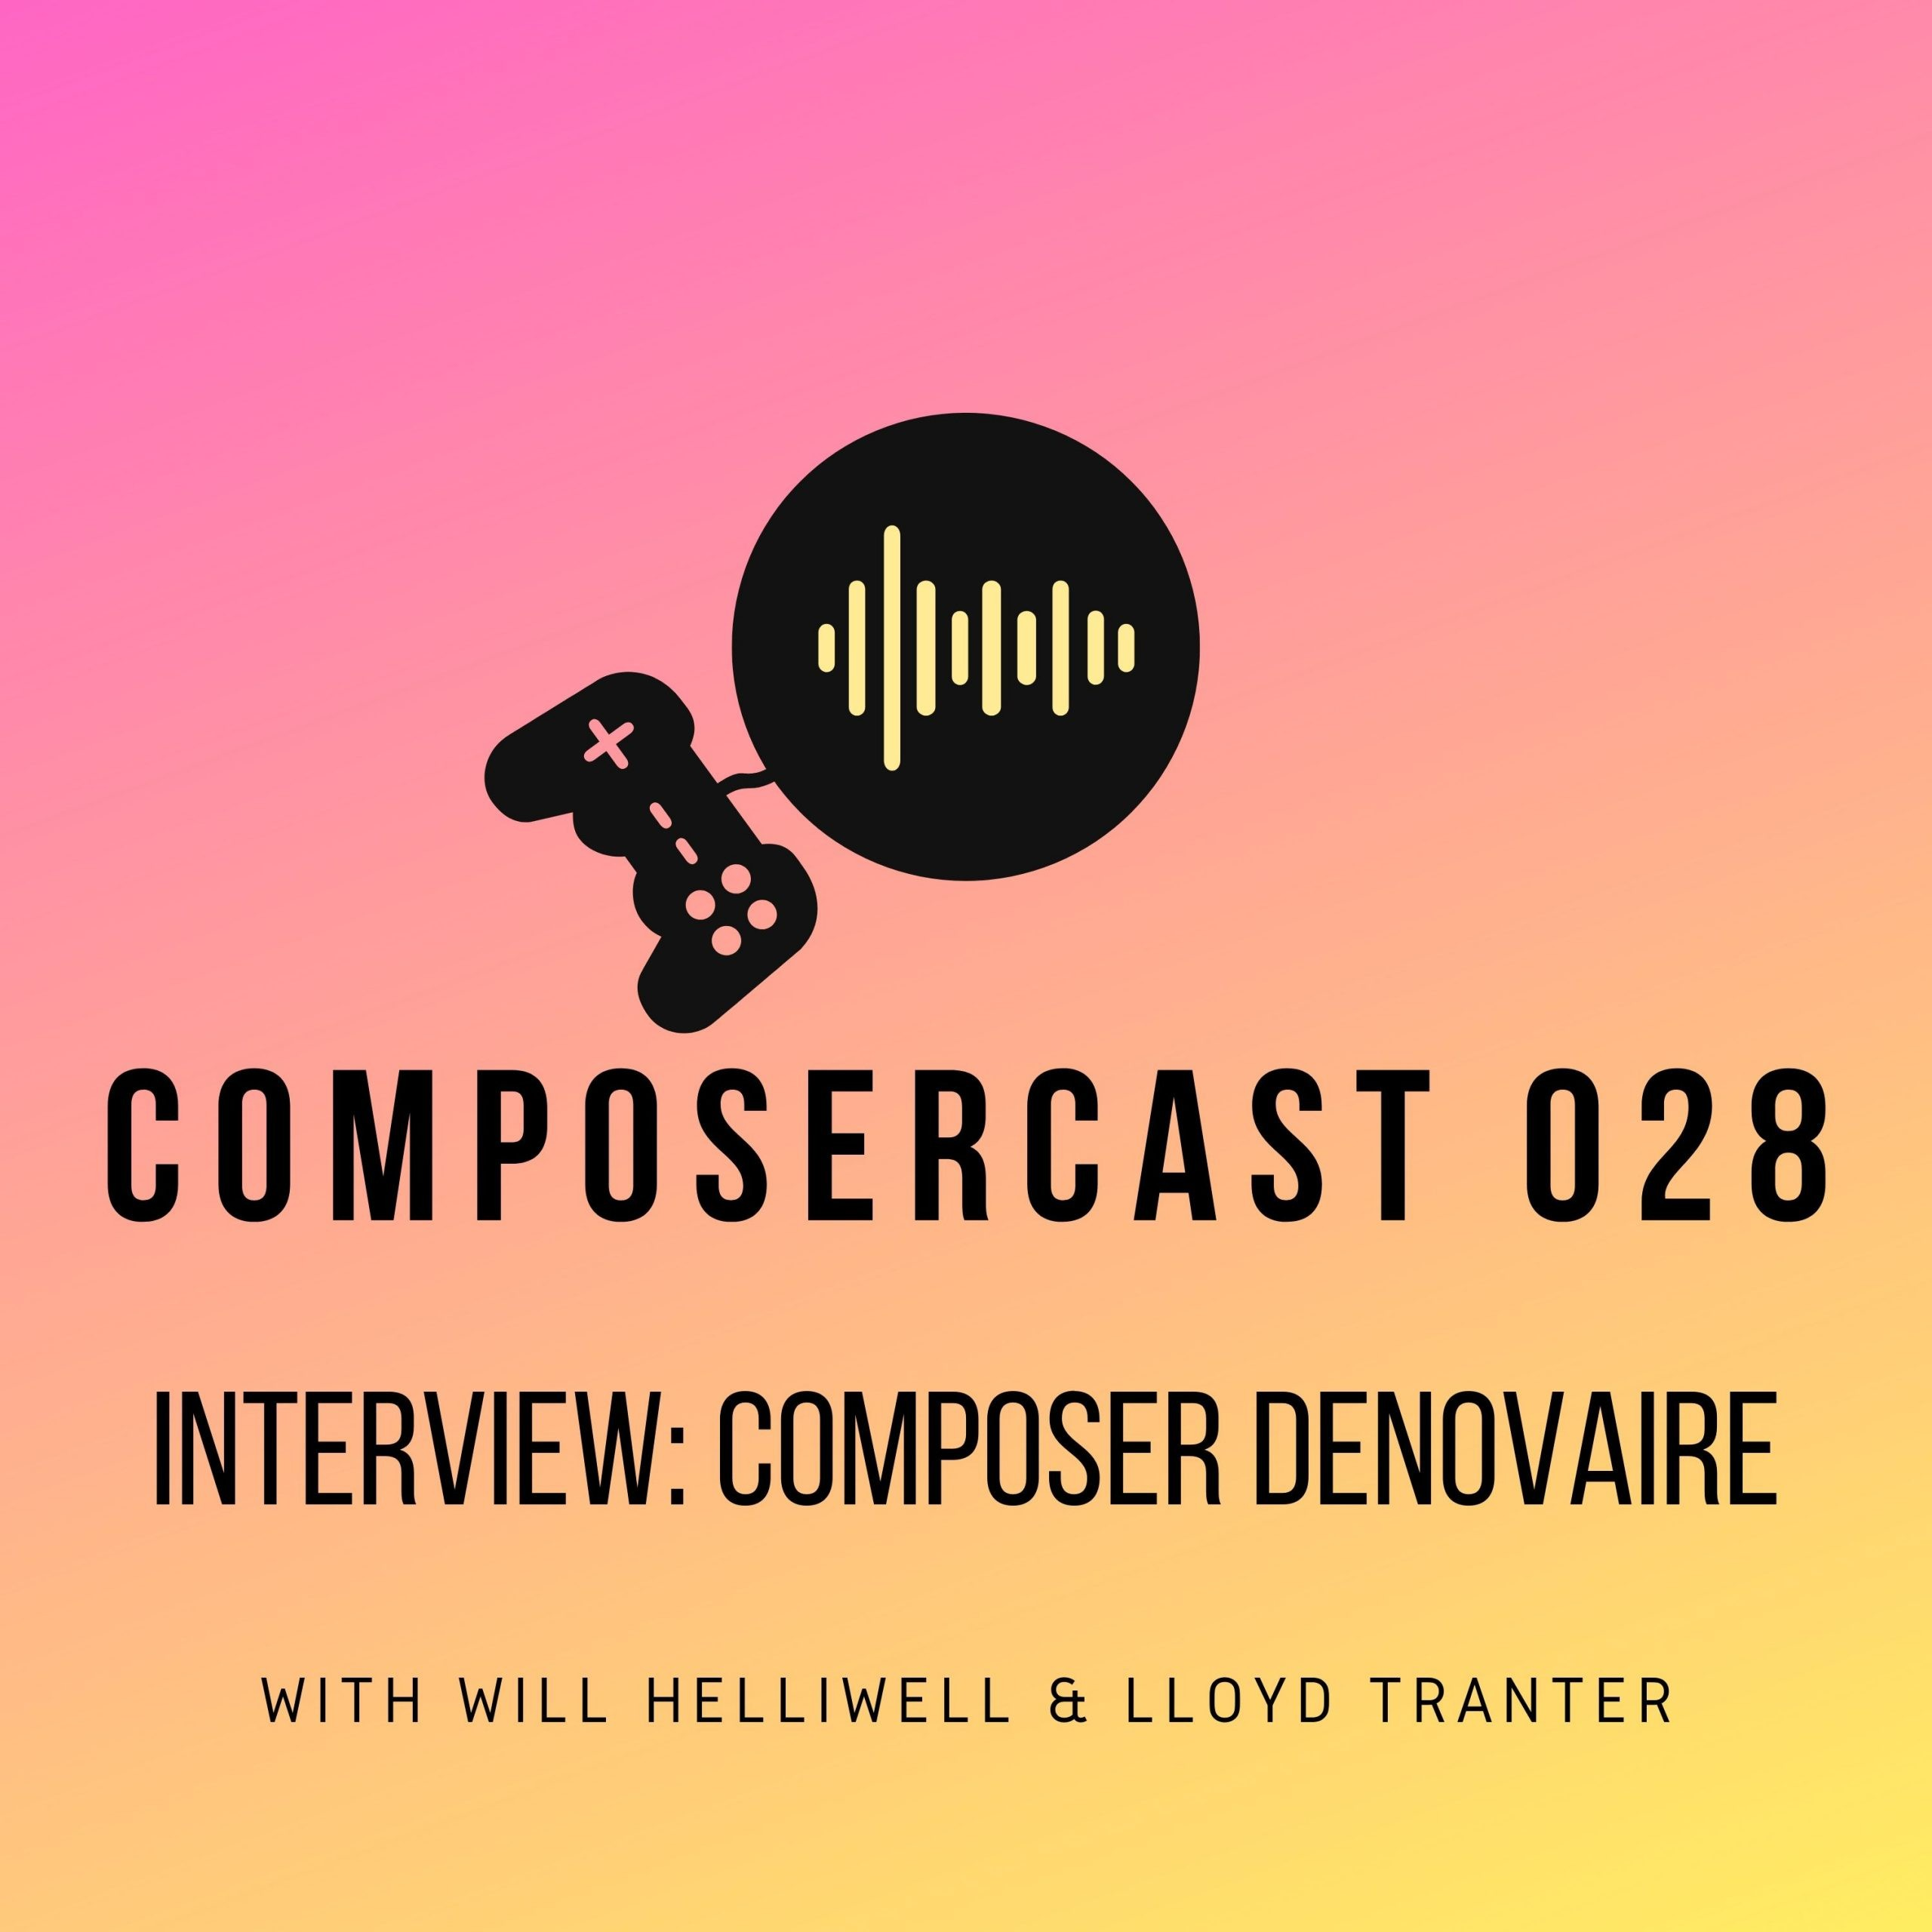 ComposerCast 028 Thumbnail